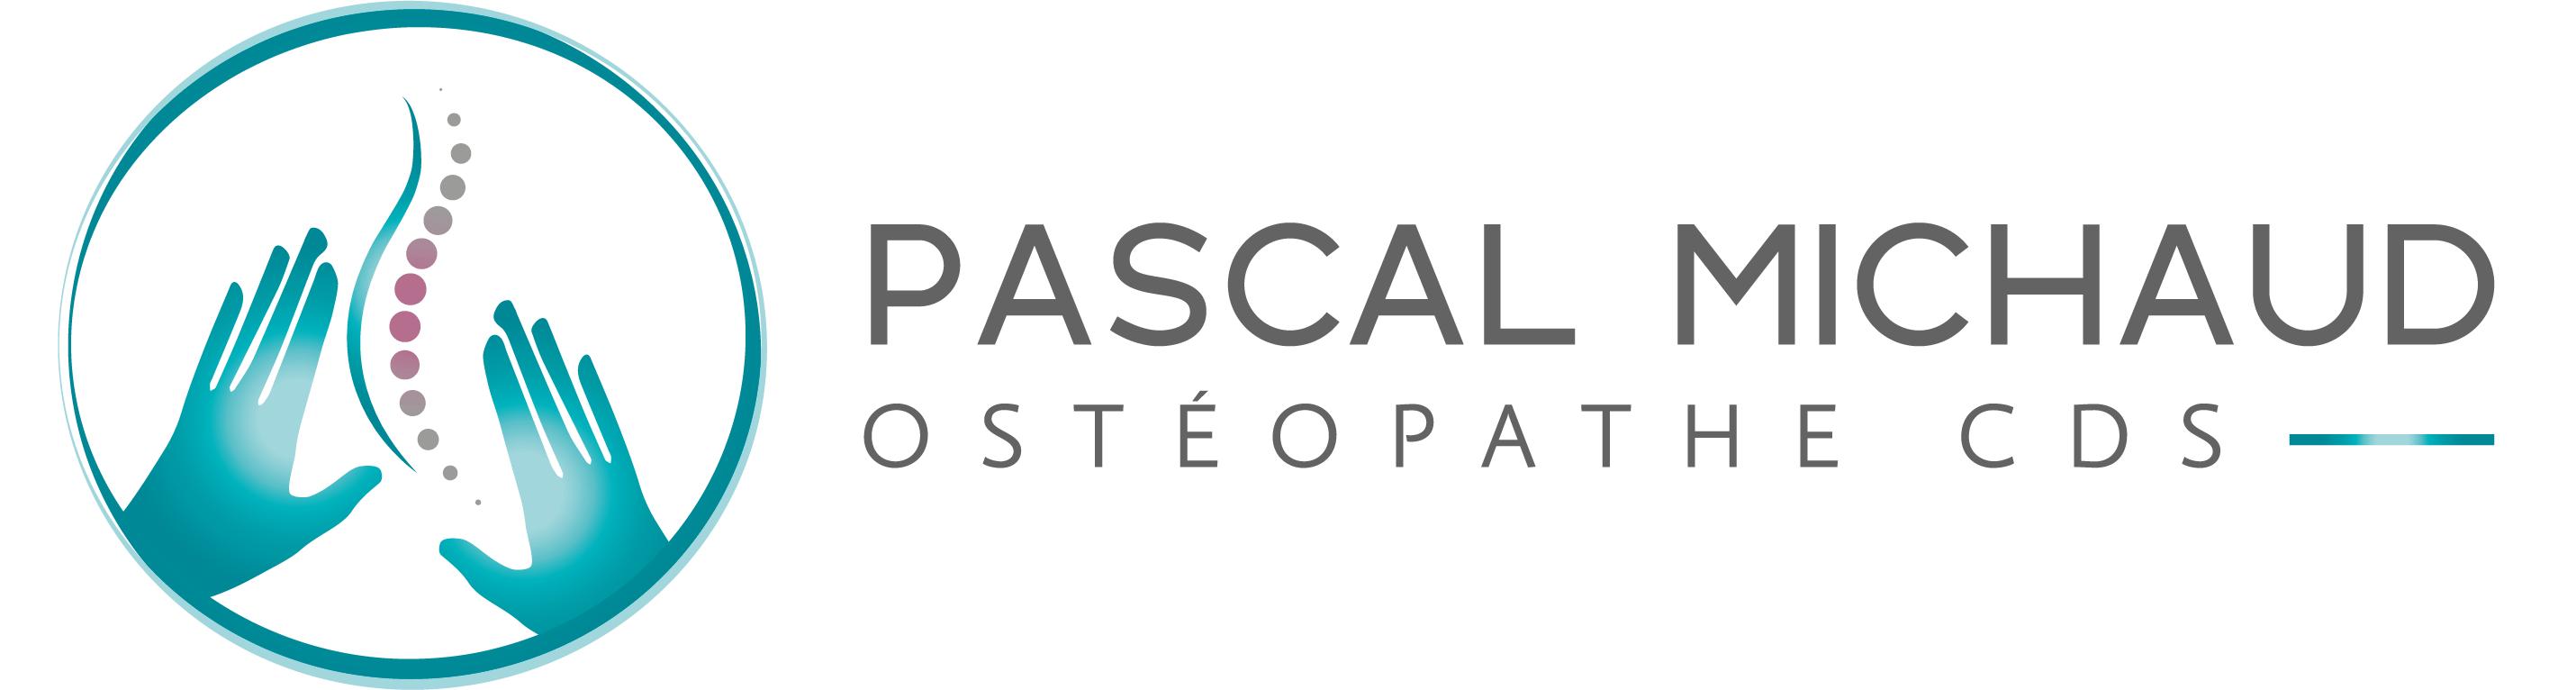 Pascal Michaud, Ostéopathe C.D.S